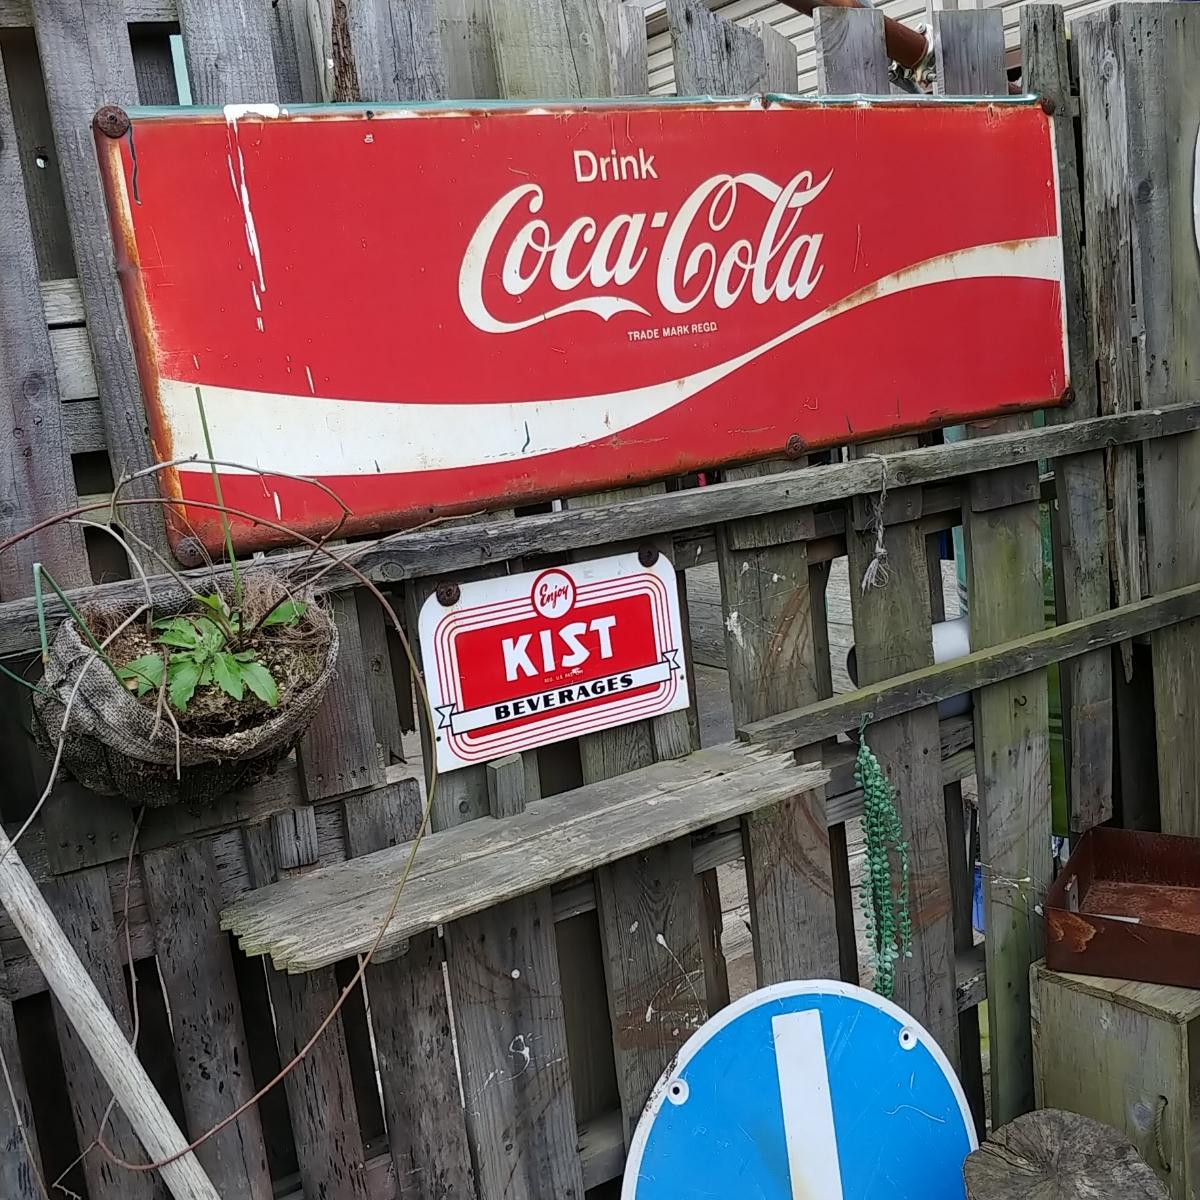 ☆AMERICAN VINTAGE SING☆Coca-Cola (コカ・コーラ)大型 フロント看板(非売品)#店舗什器#世田谷ベース #ガレージライフ_画像2